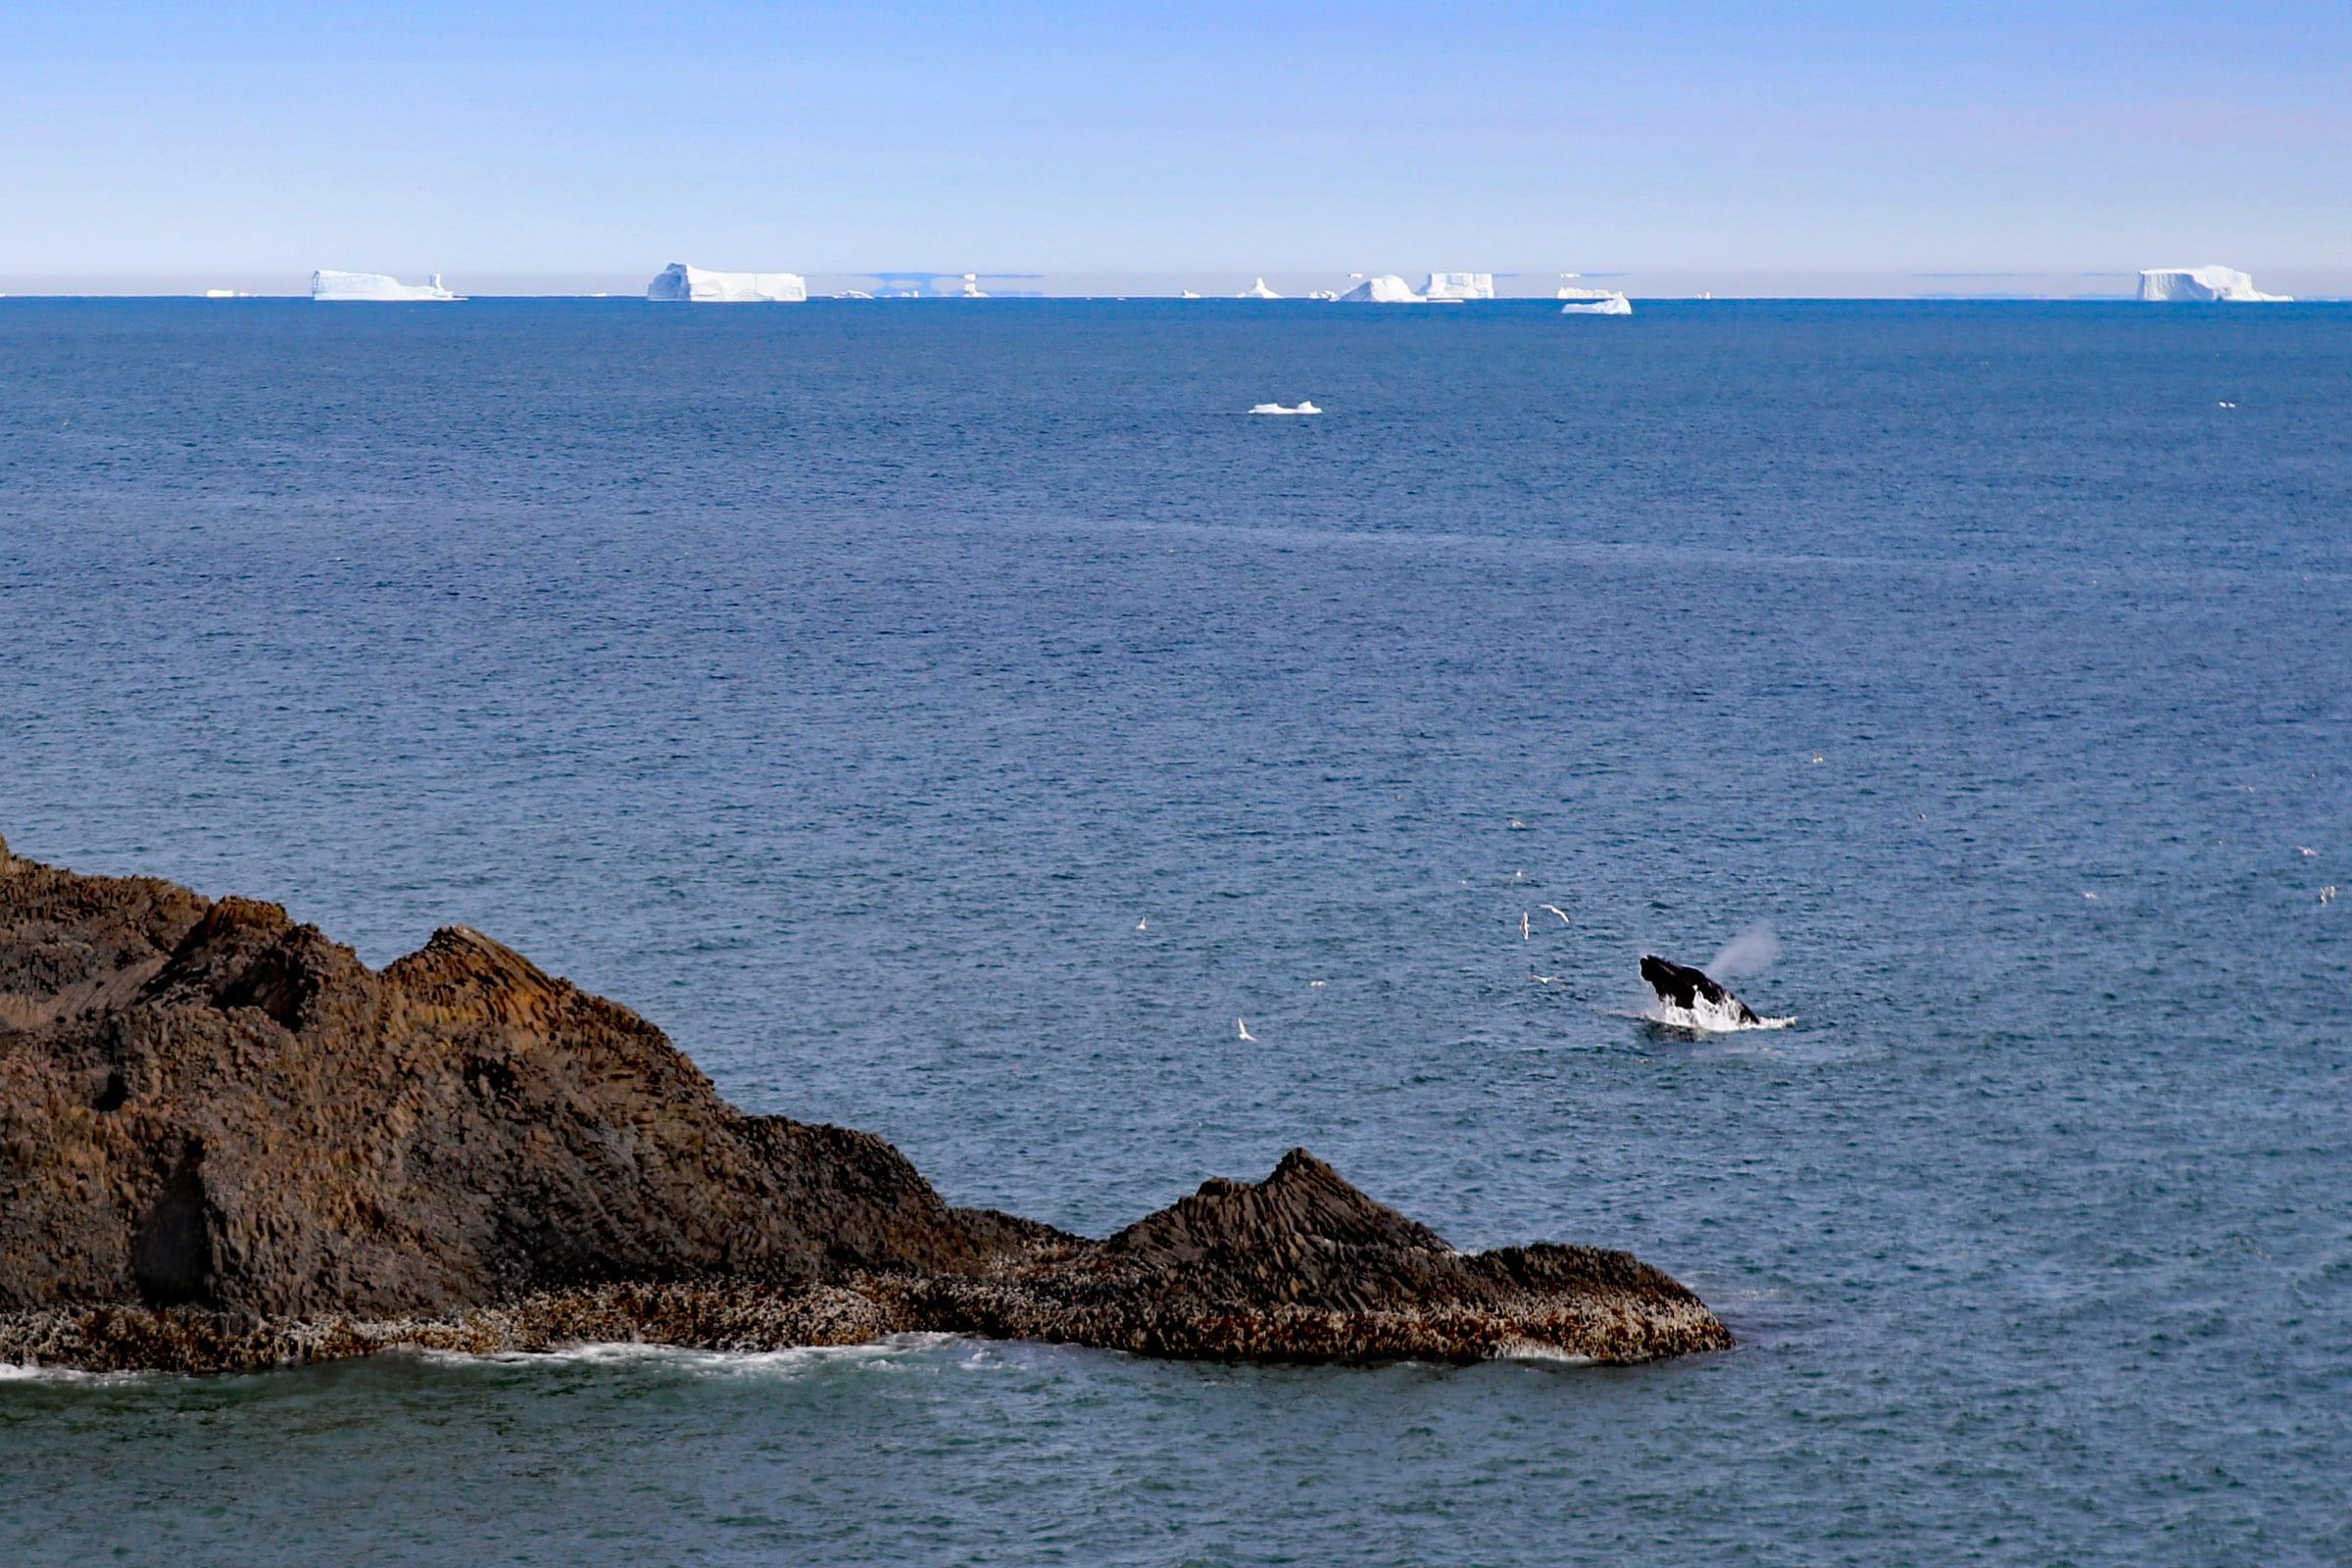 Whale watchig from the shore in Qeqertarsuaq Greenland. Jurga Rubinovaite.